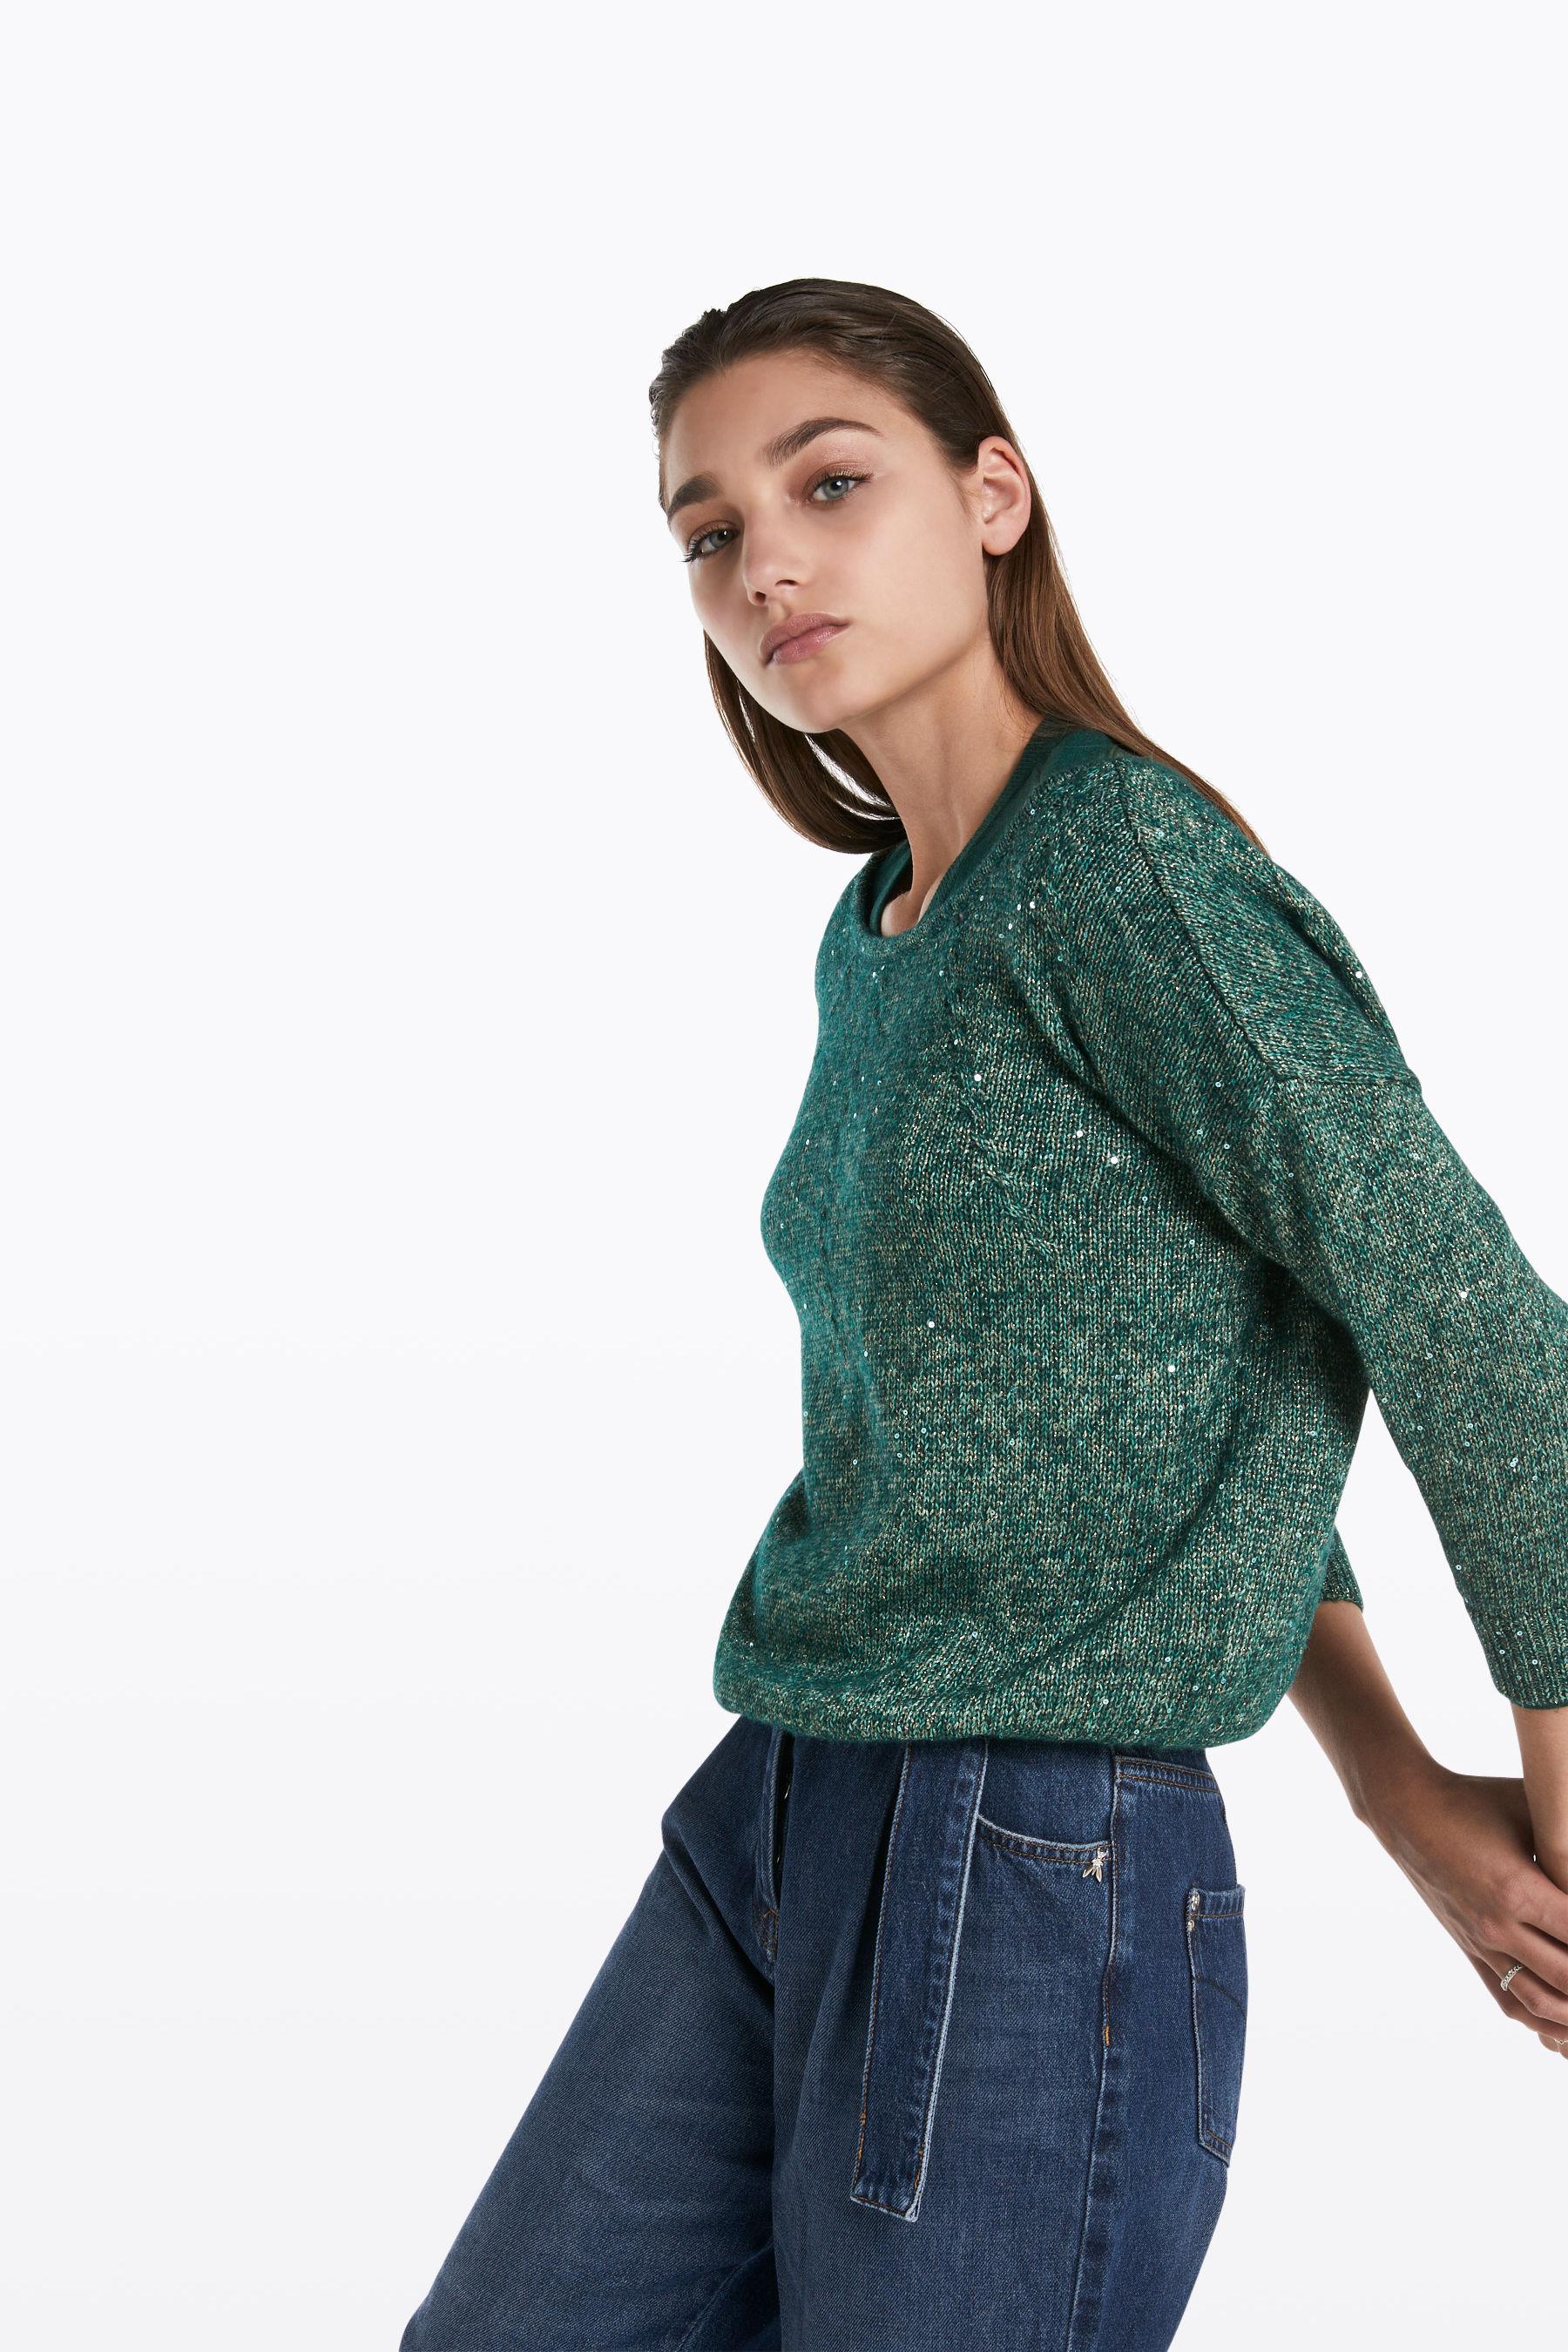 Jersey de pico o cuello redondo? | Carmen Personal Shopper